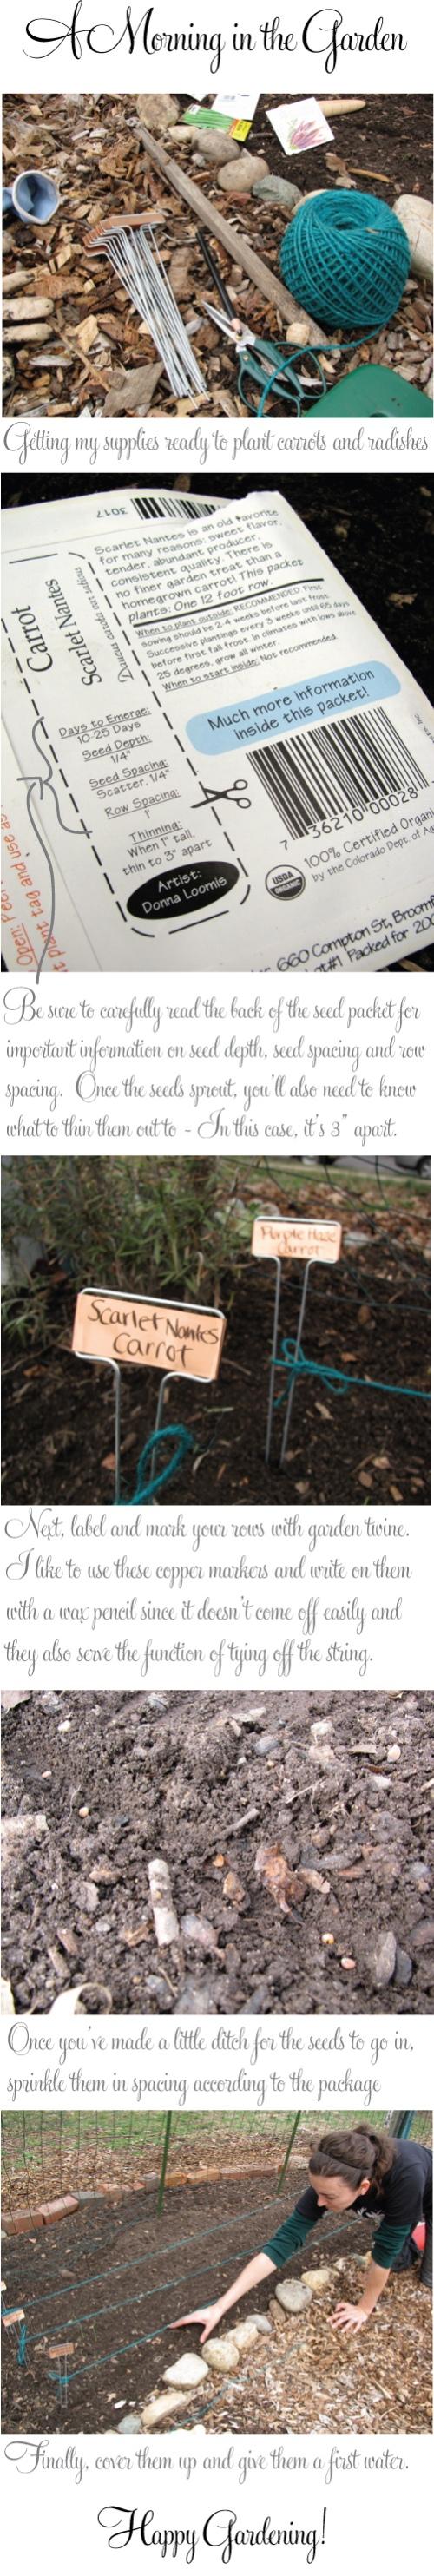 sarah-meyer-walsh-garden